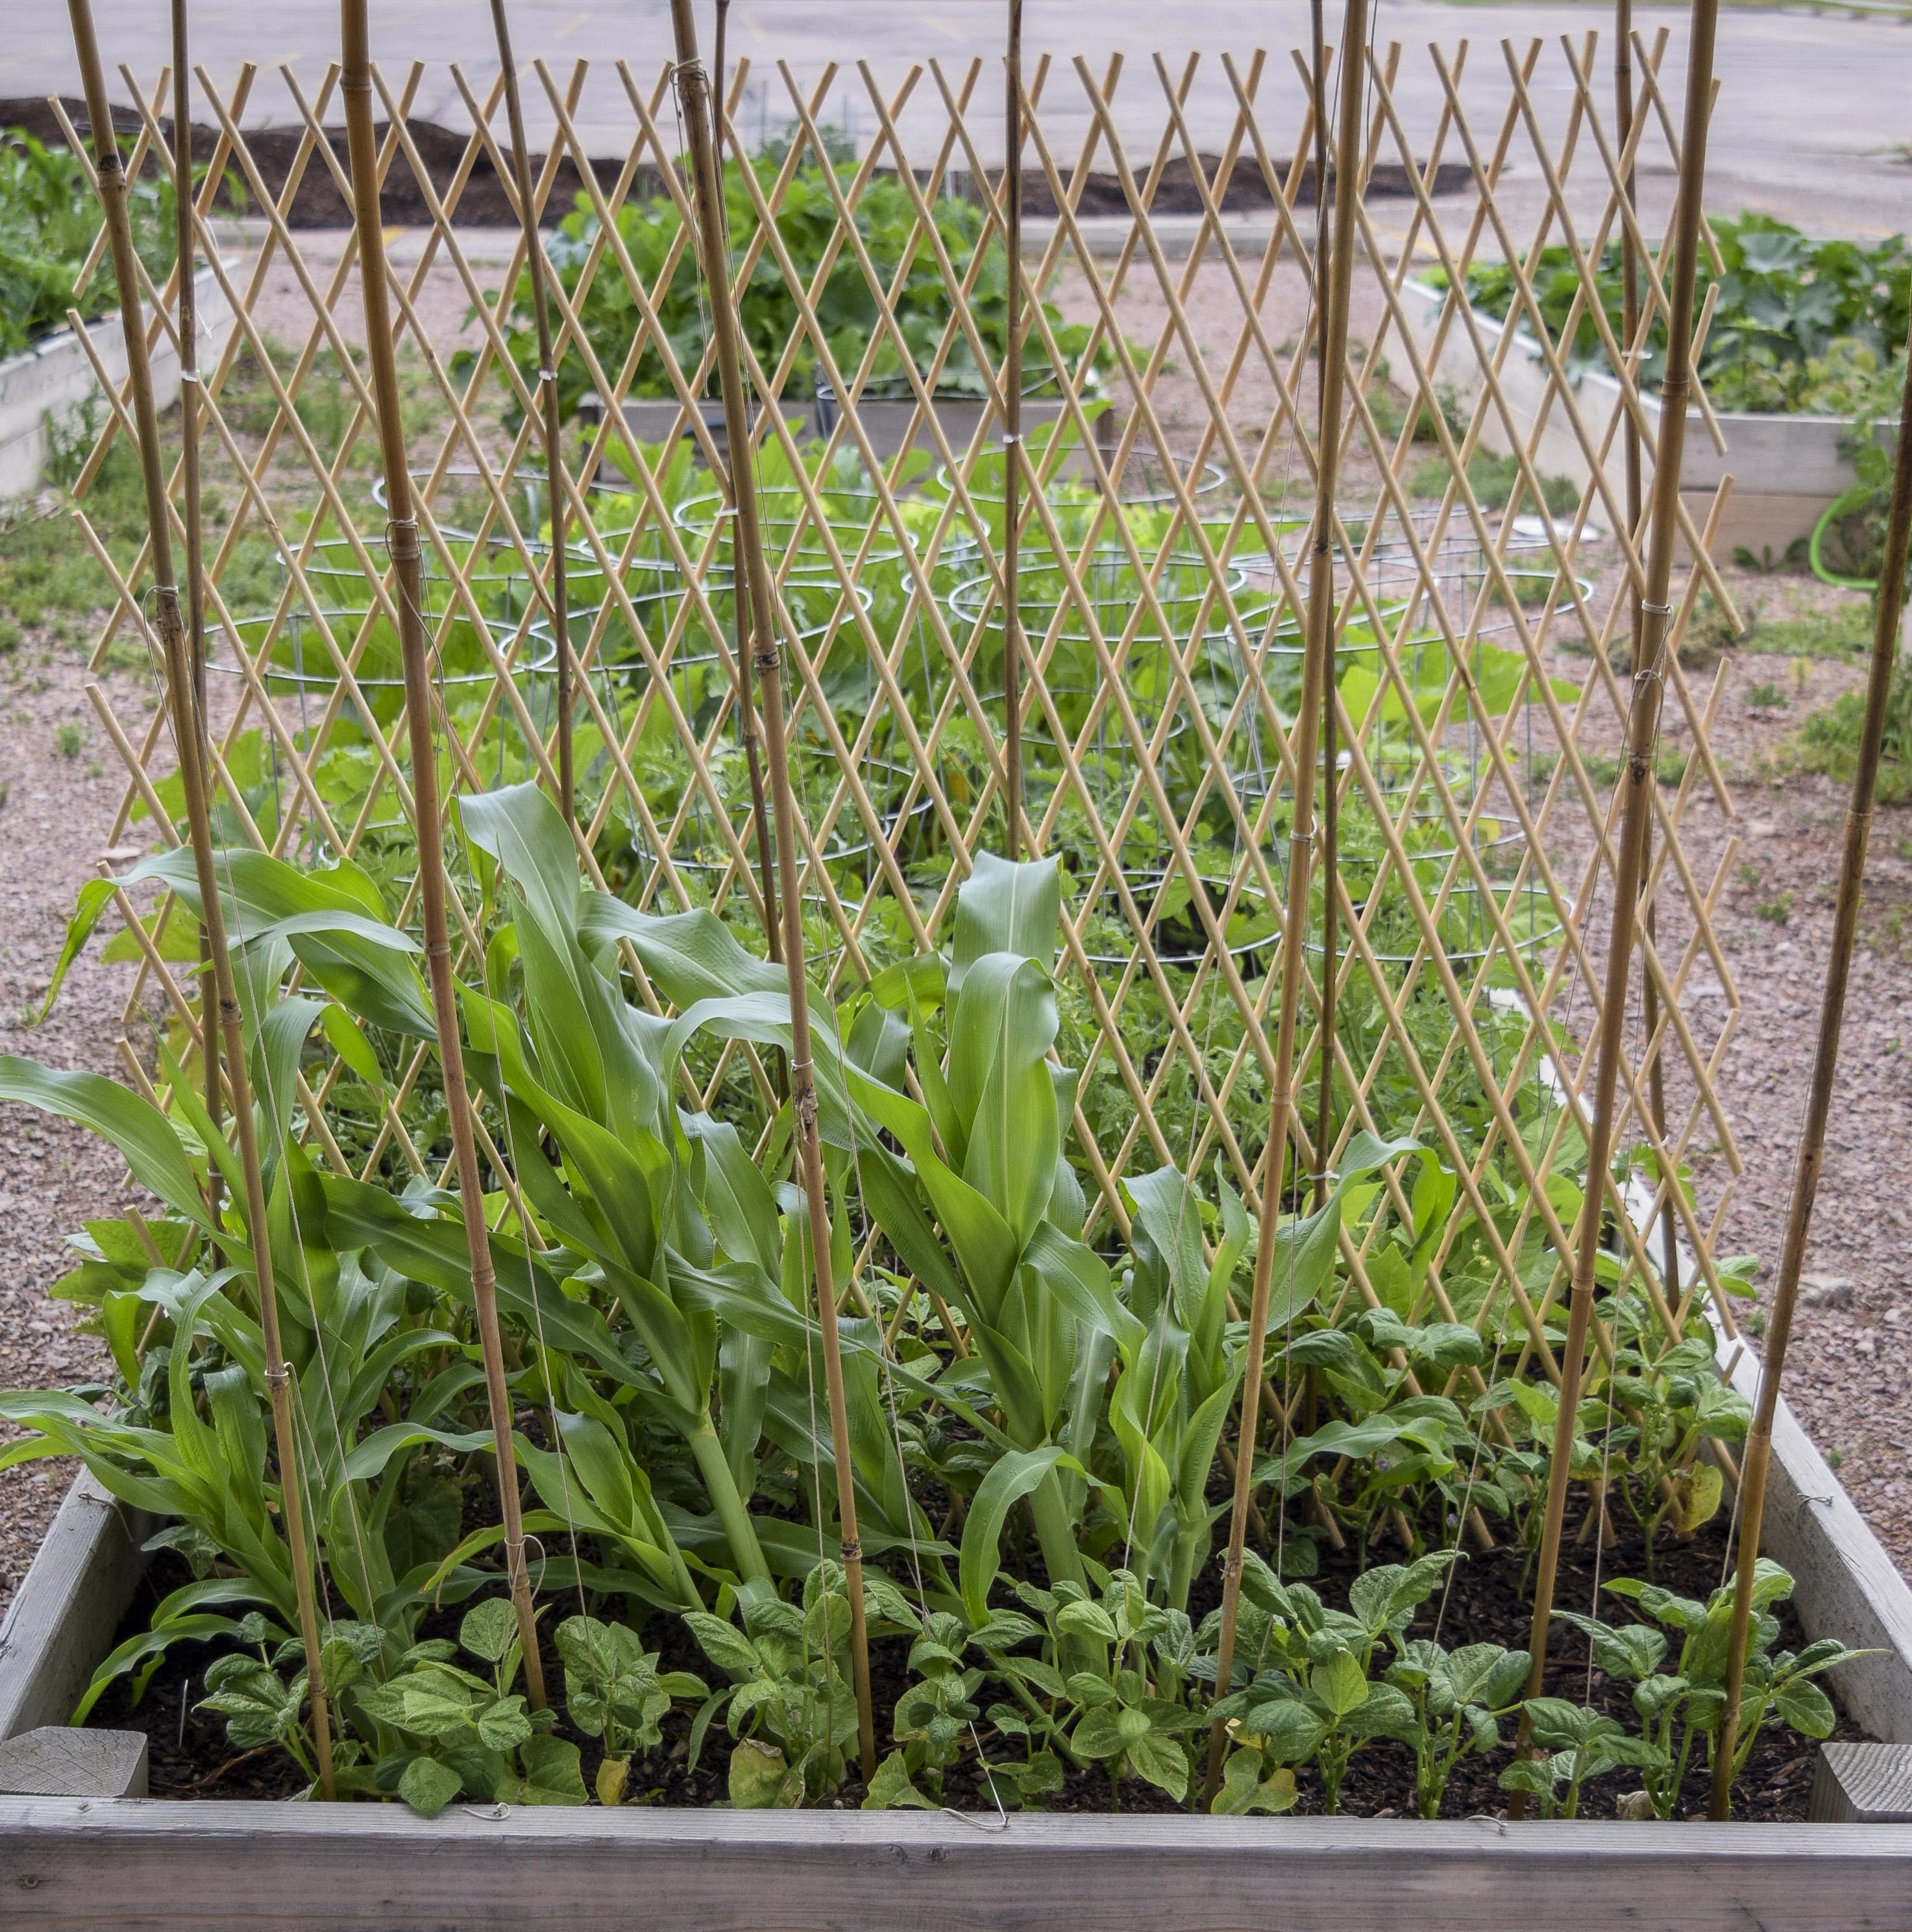 East Madison Community Garden